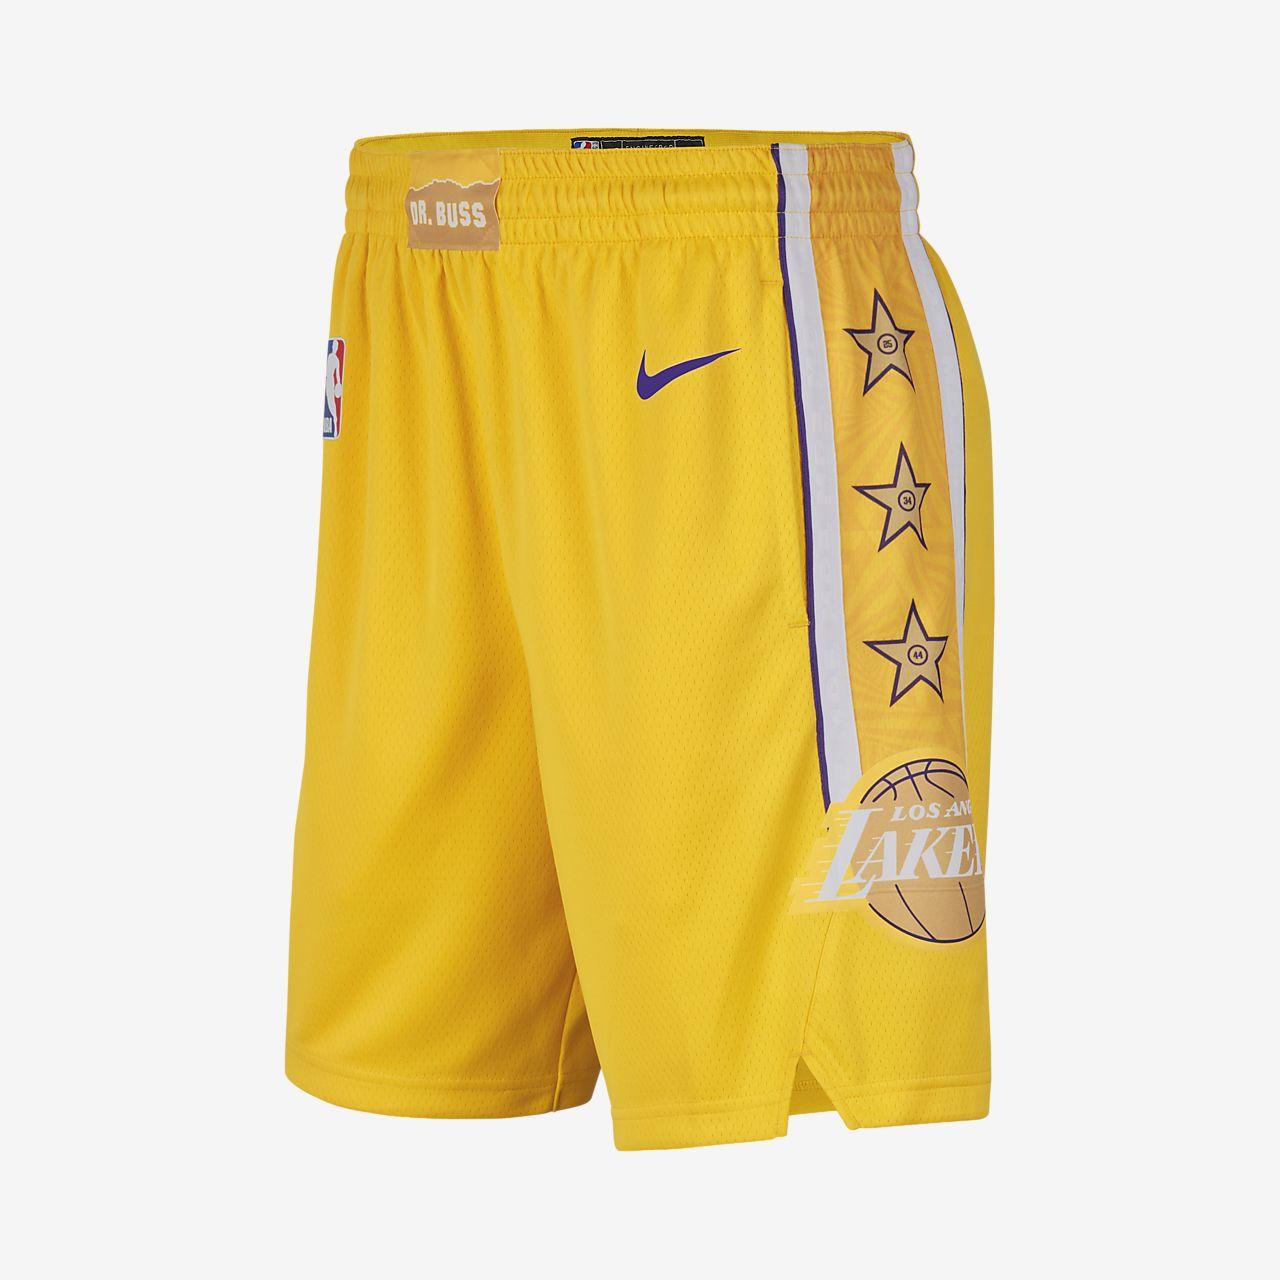 city edition shorts